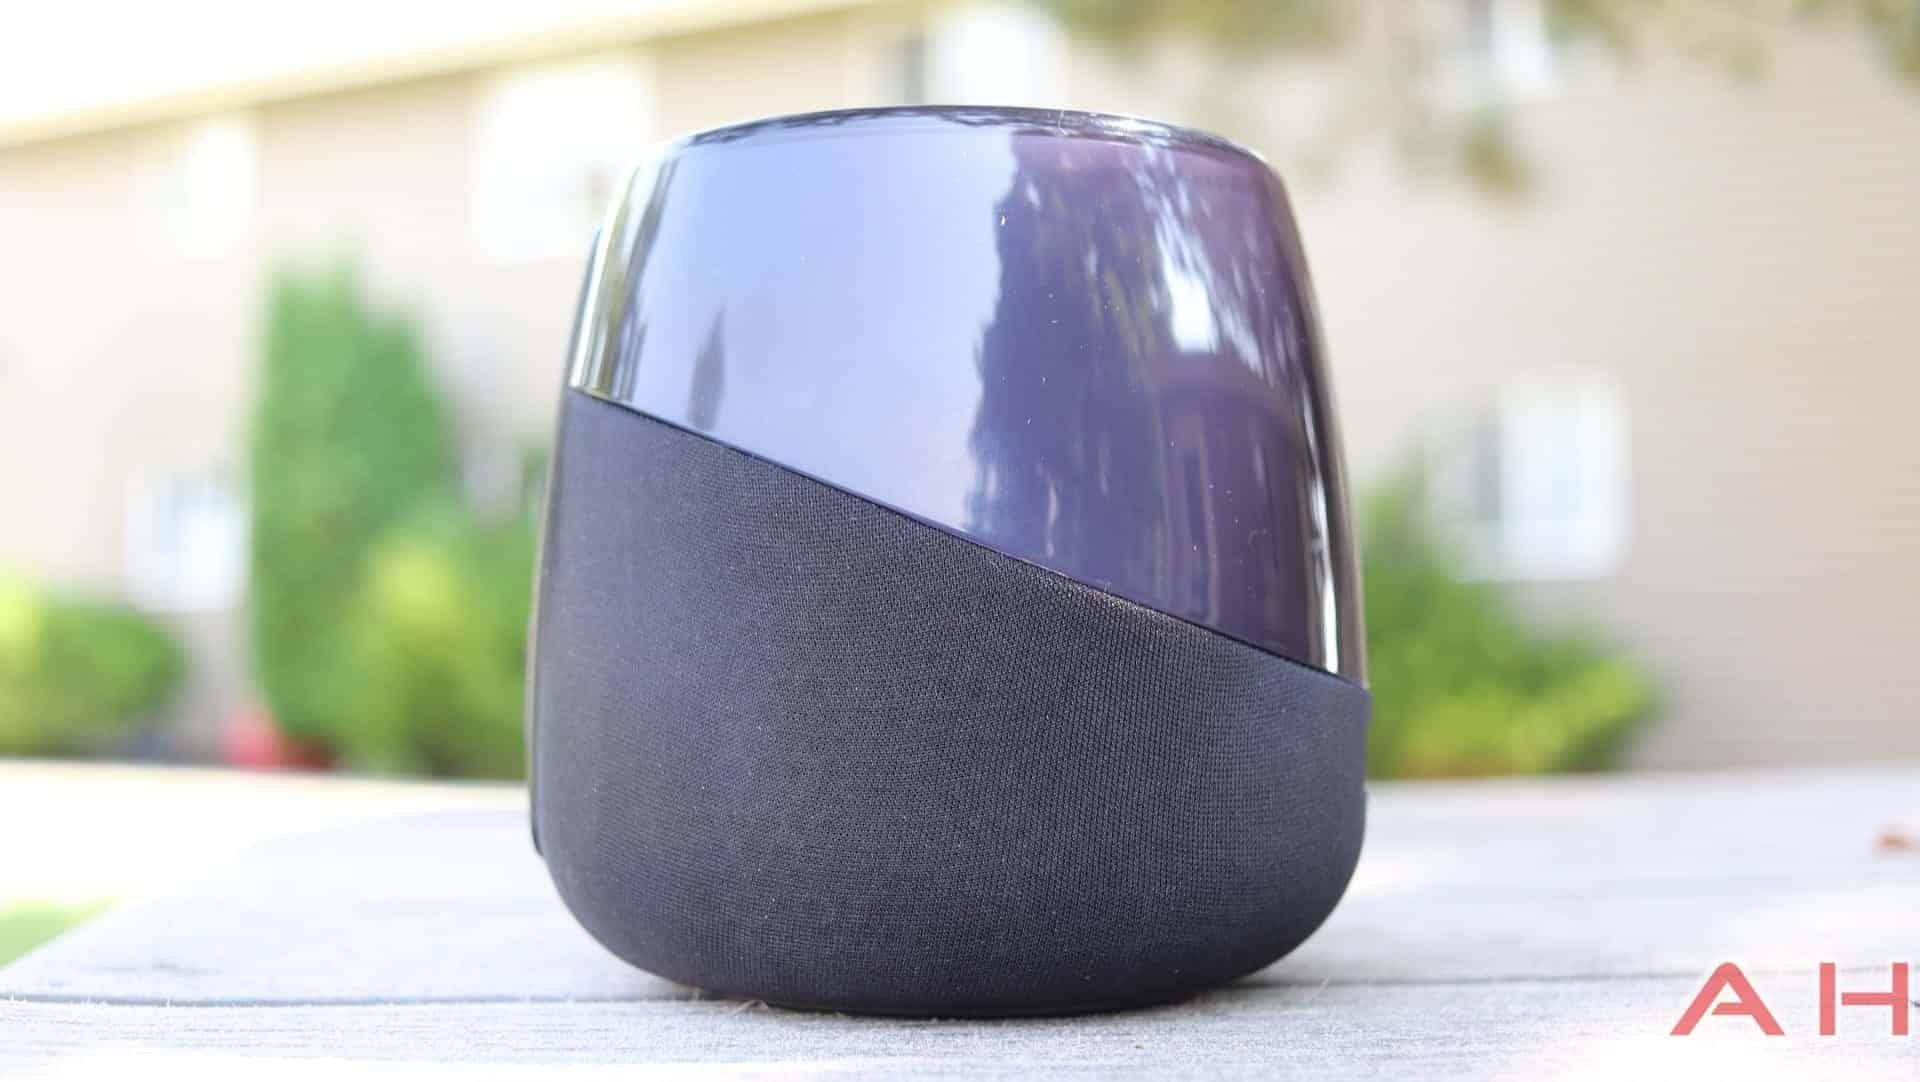 iHome iAV5 Echo Dot Dock Bluetooth Speaker Review Hardware Gall 03